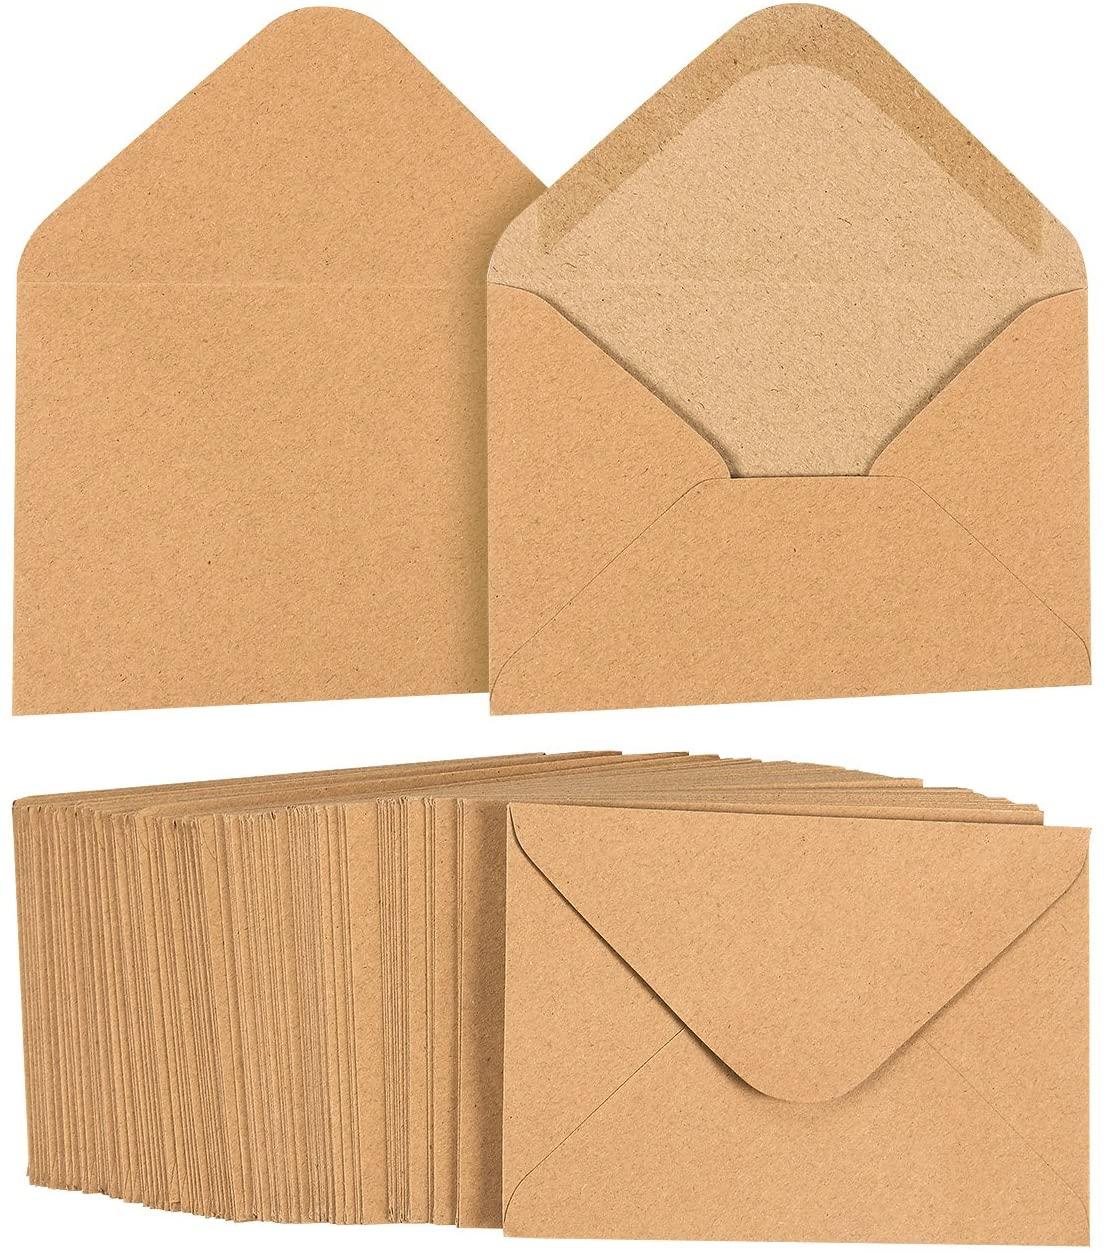 Juvale A1 Envelopes Bulk - 100-Count A1 Invitation Envelopes, Kraft Paper Envelopes for 5 x 3 Inch Wedding, Baby Shower, Party RSVP Invitations, V-Flap Photo Envelopes, Brown, 3 5/8 x 5 1/8 Inches